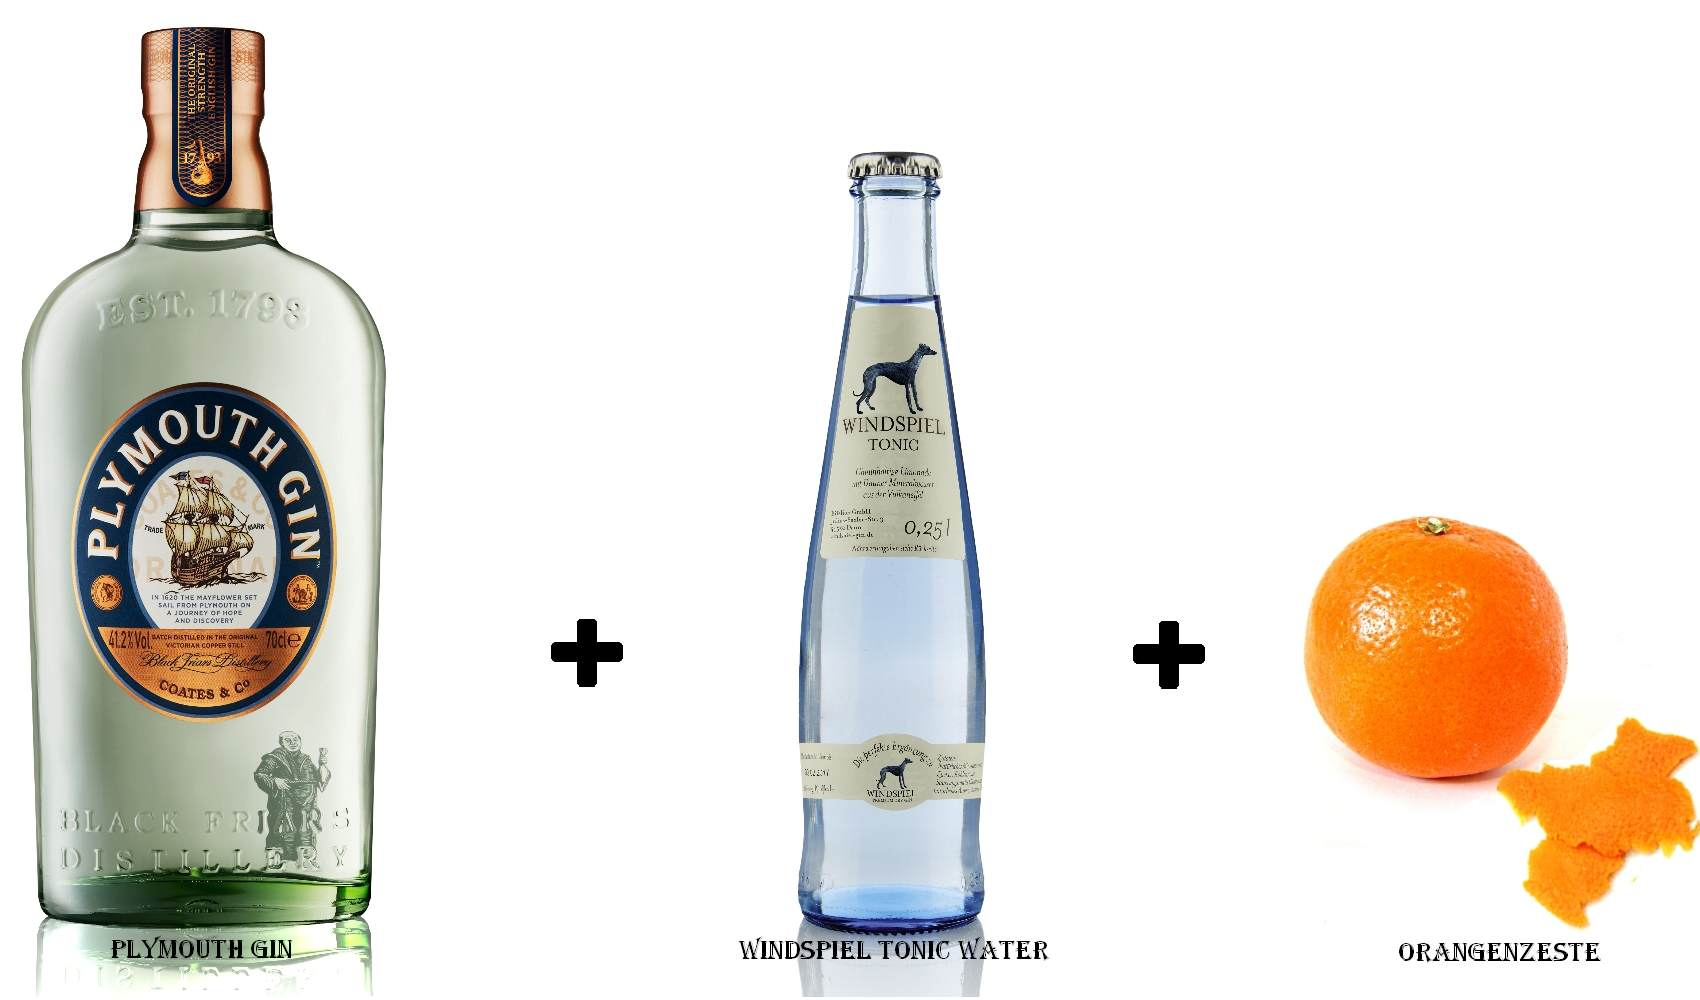 Plymouth Gin + Windspiel Tonic Water + Orangenzeste